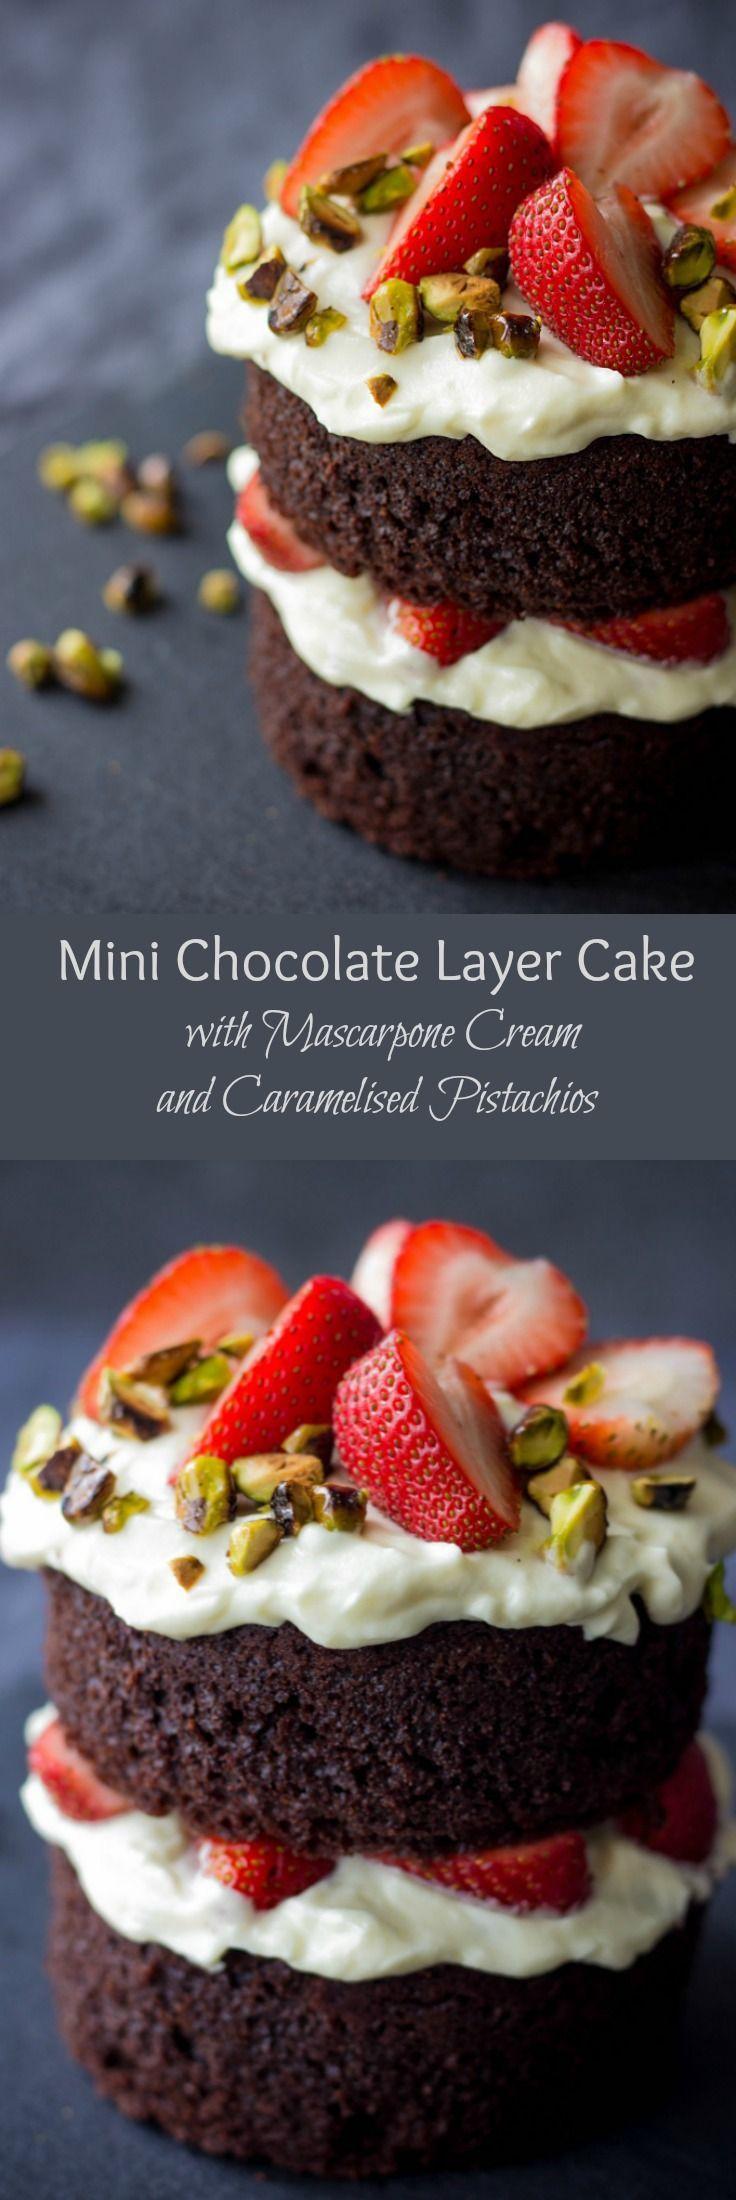 Mini Chocolate Cake with Mascarpone Cream and Caramelised Pistachios : lavenderandmacarons